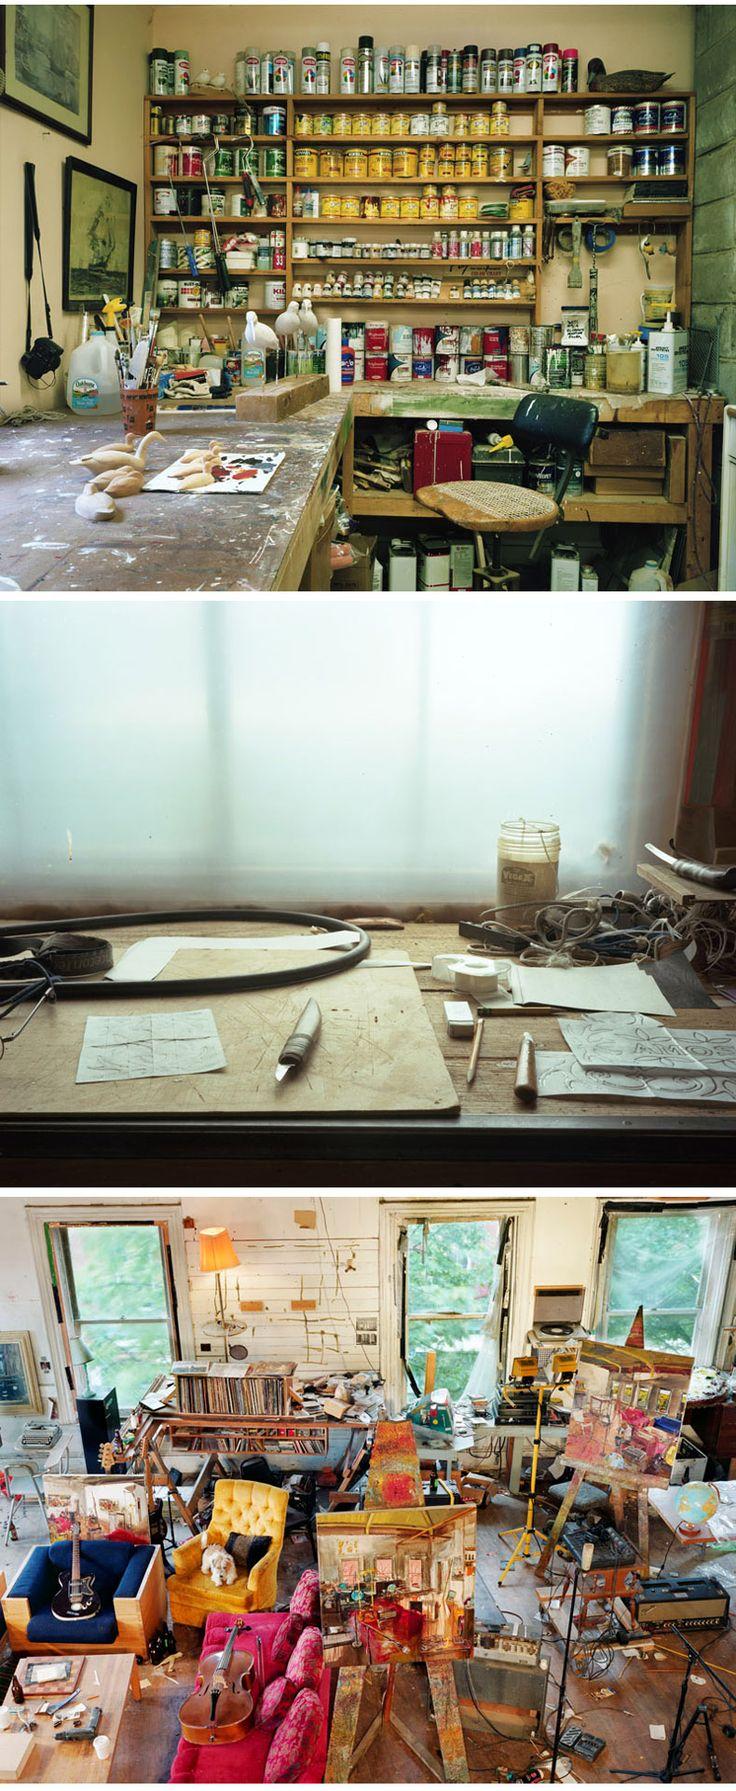 Meggan Gould #workspace #studio http://thefoxisblack.com/2012/09/25/workspaces-an-exploration-into-the-places-we-make-by-meggan-gould/